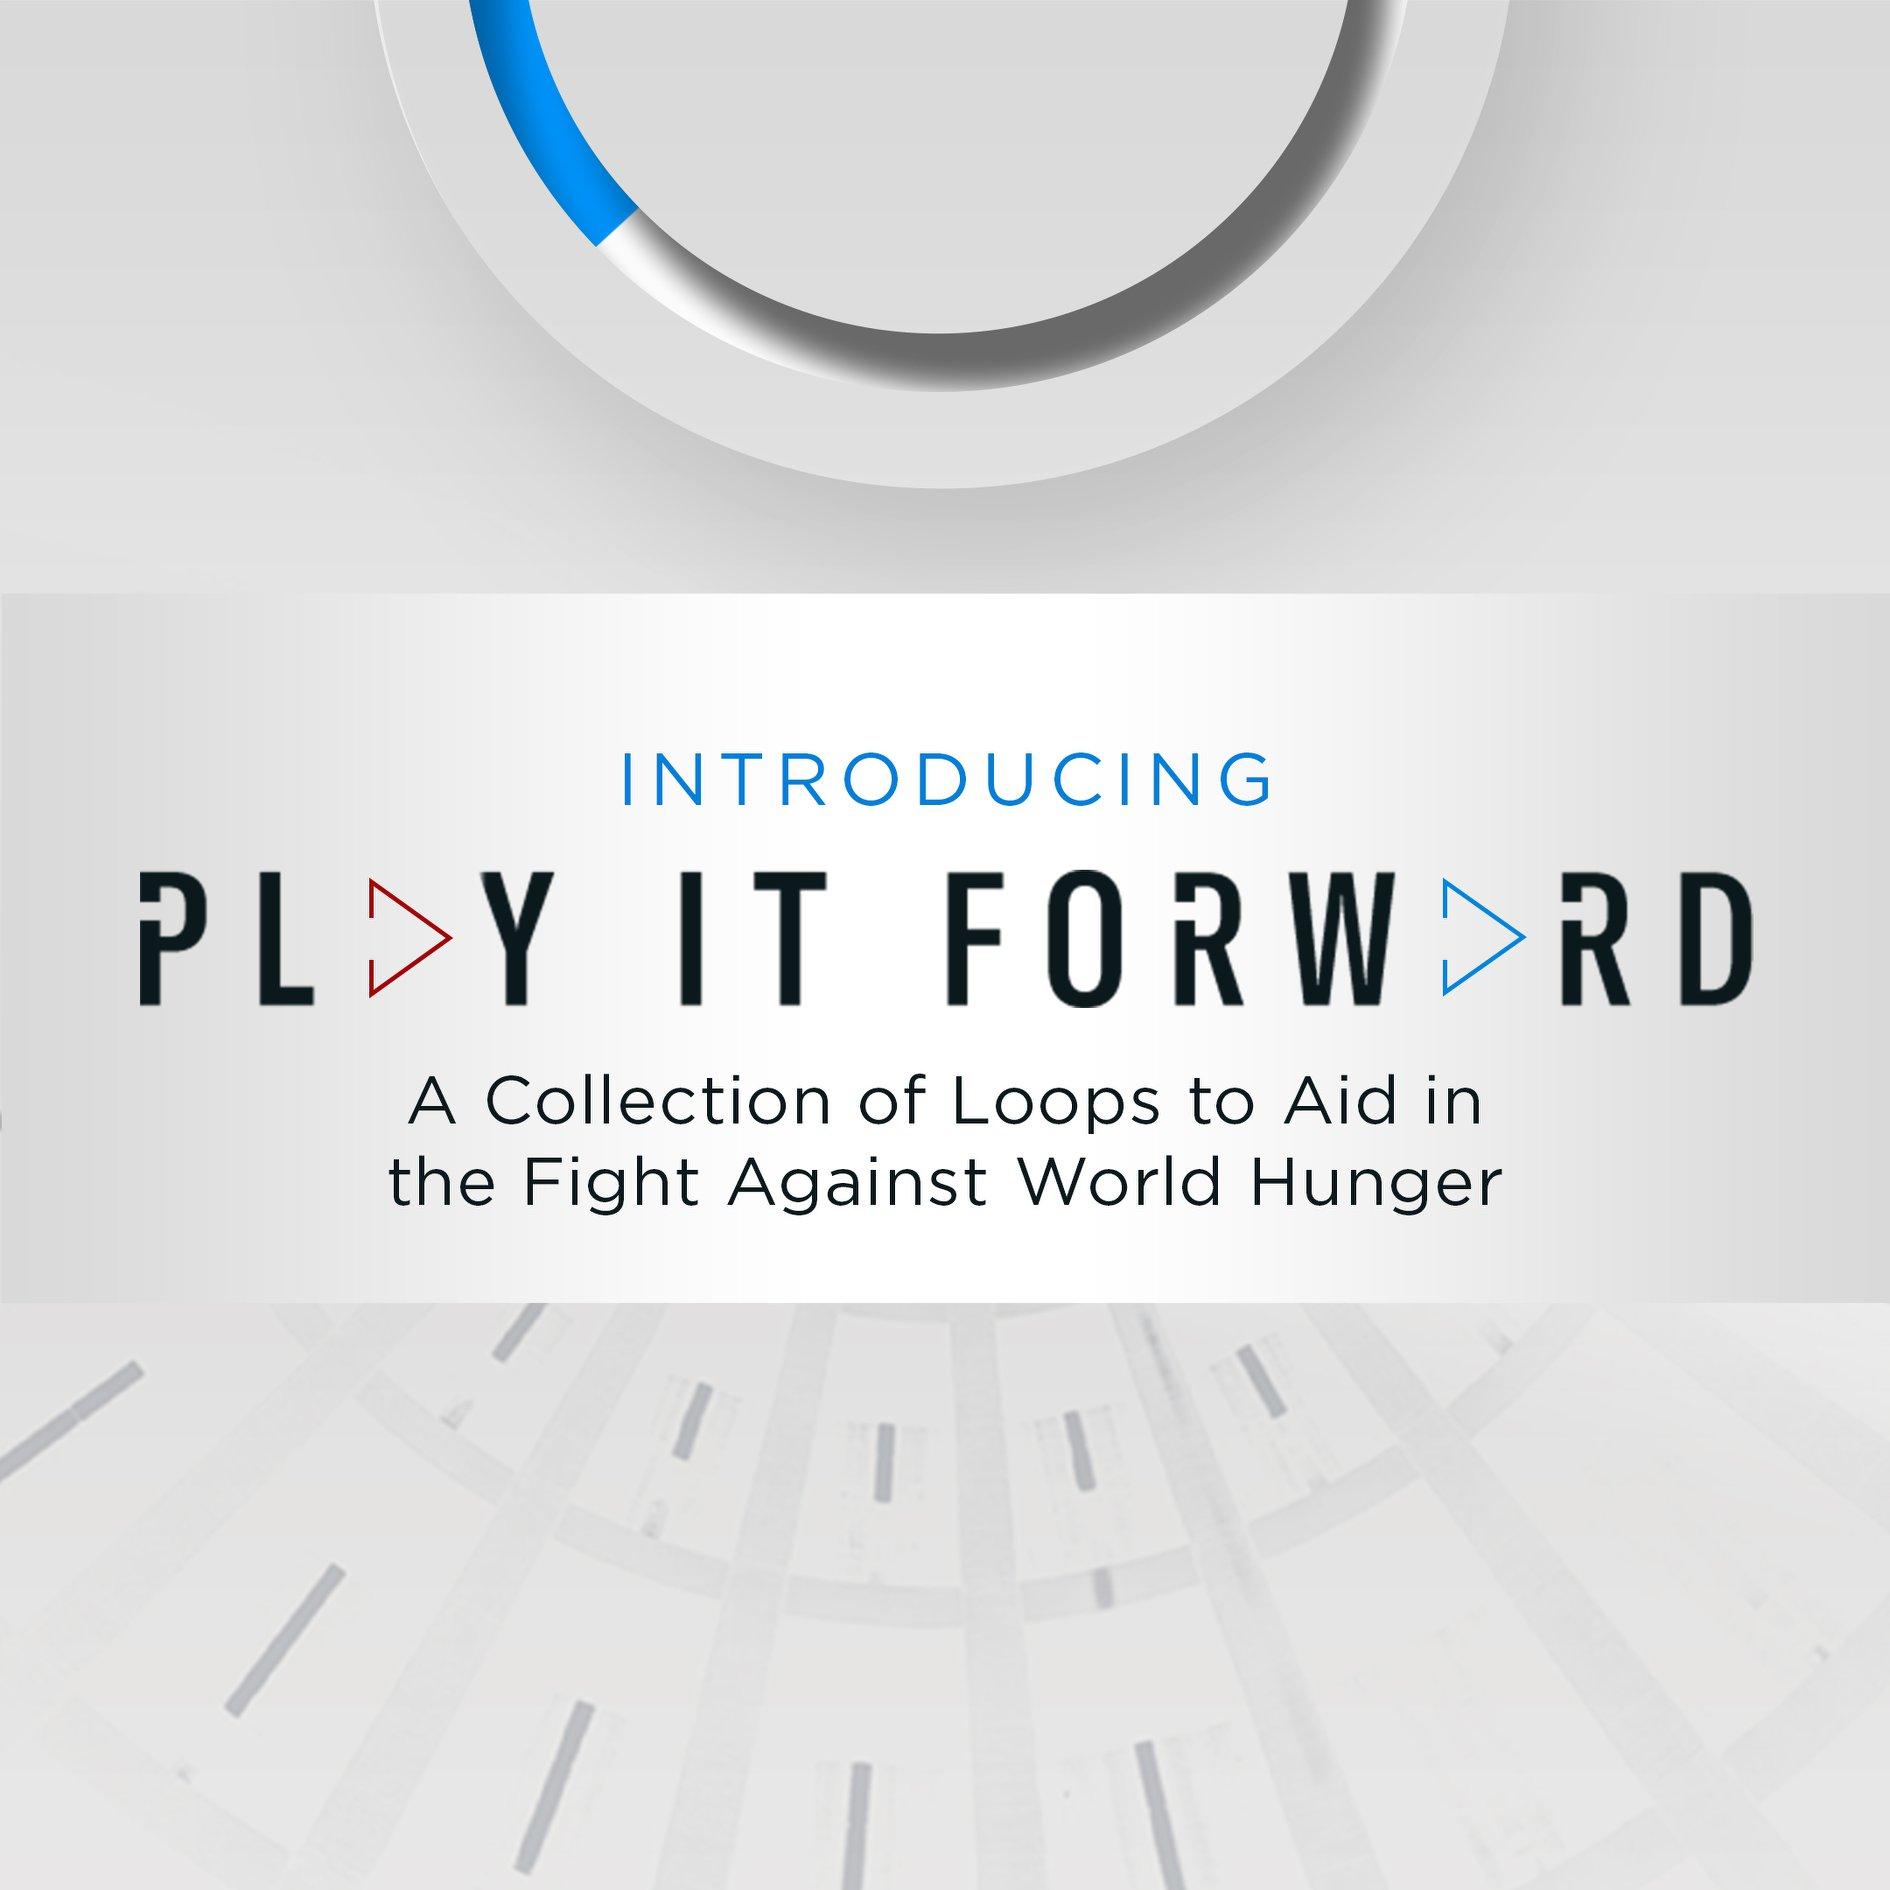 play_it_forward.jpg